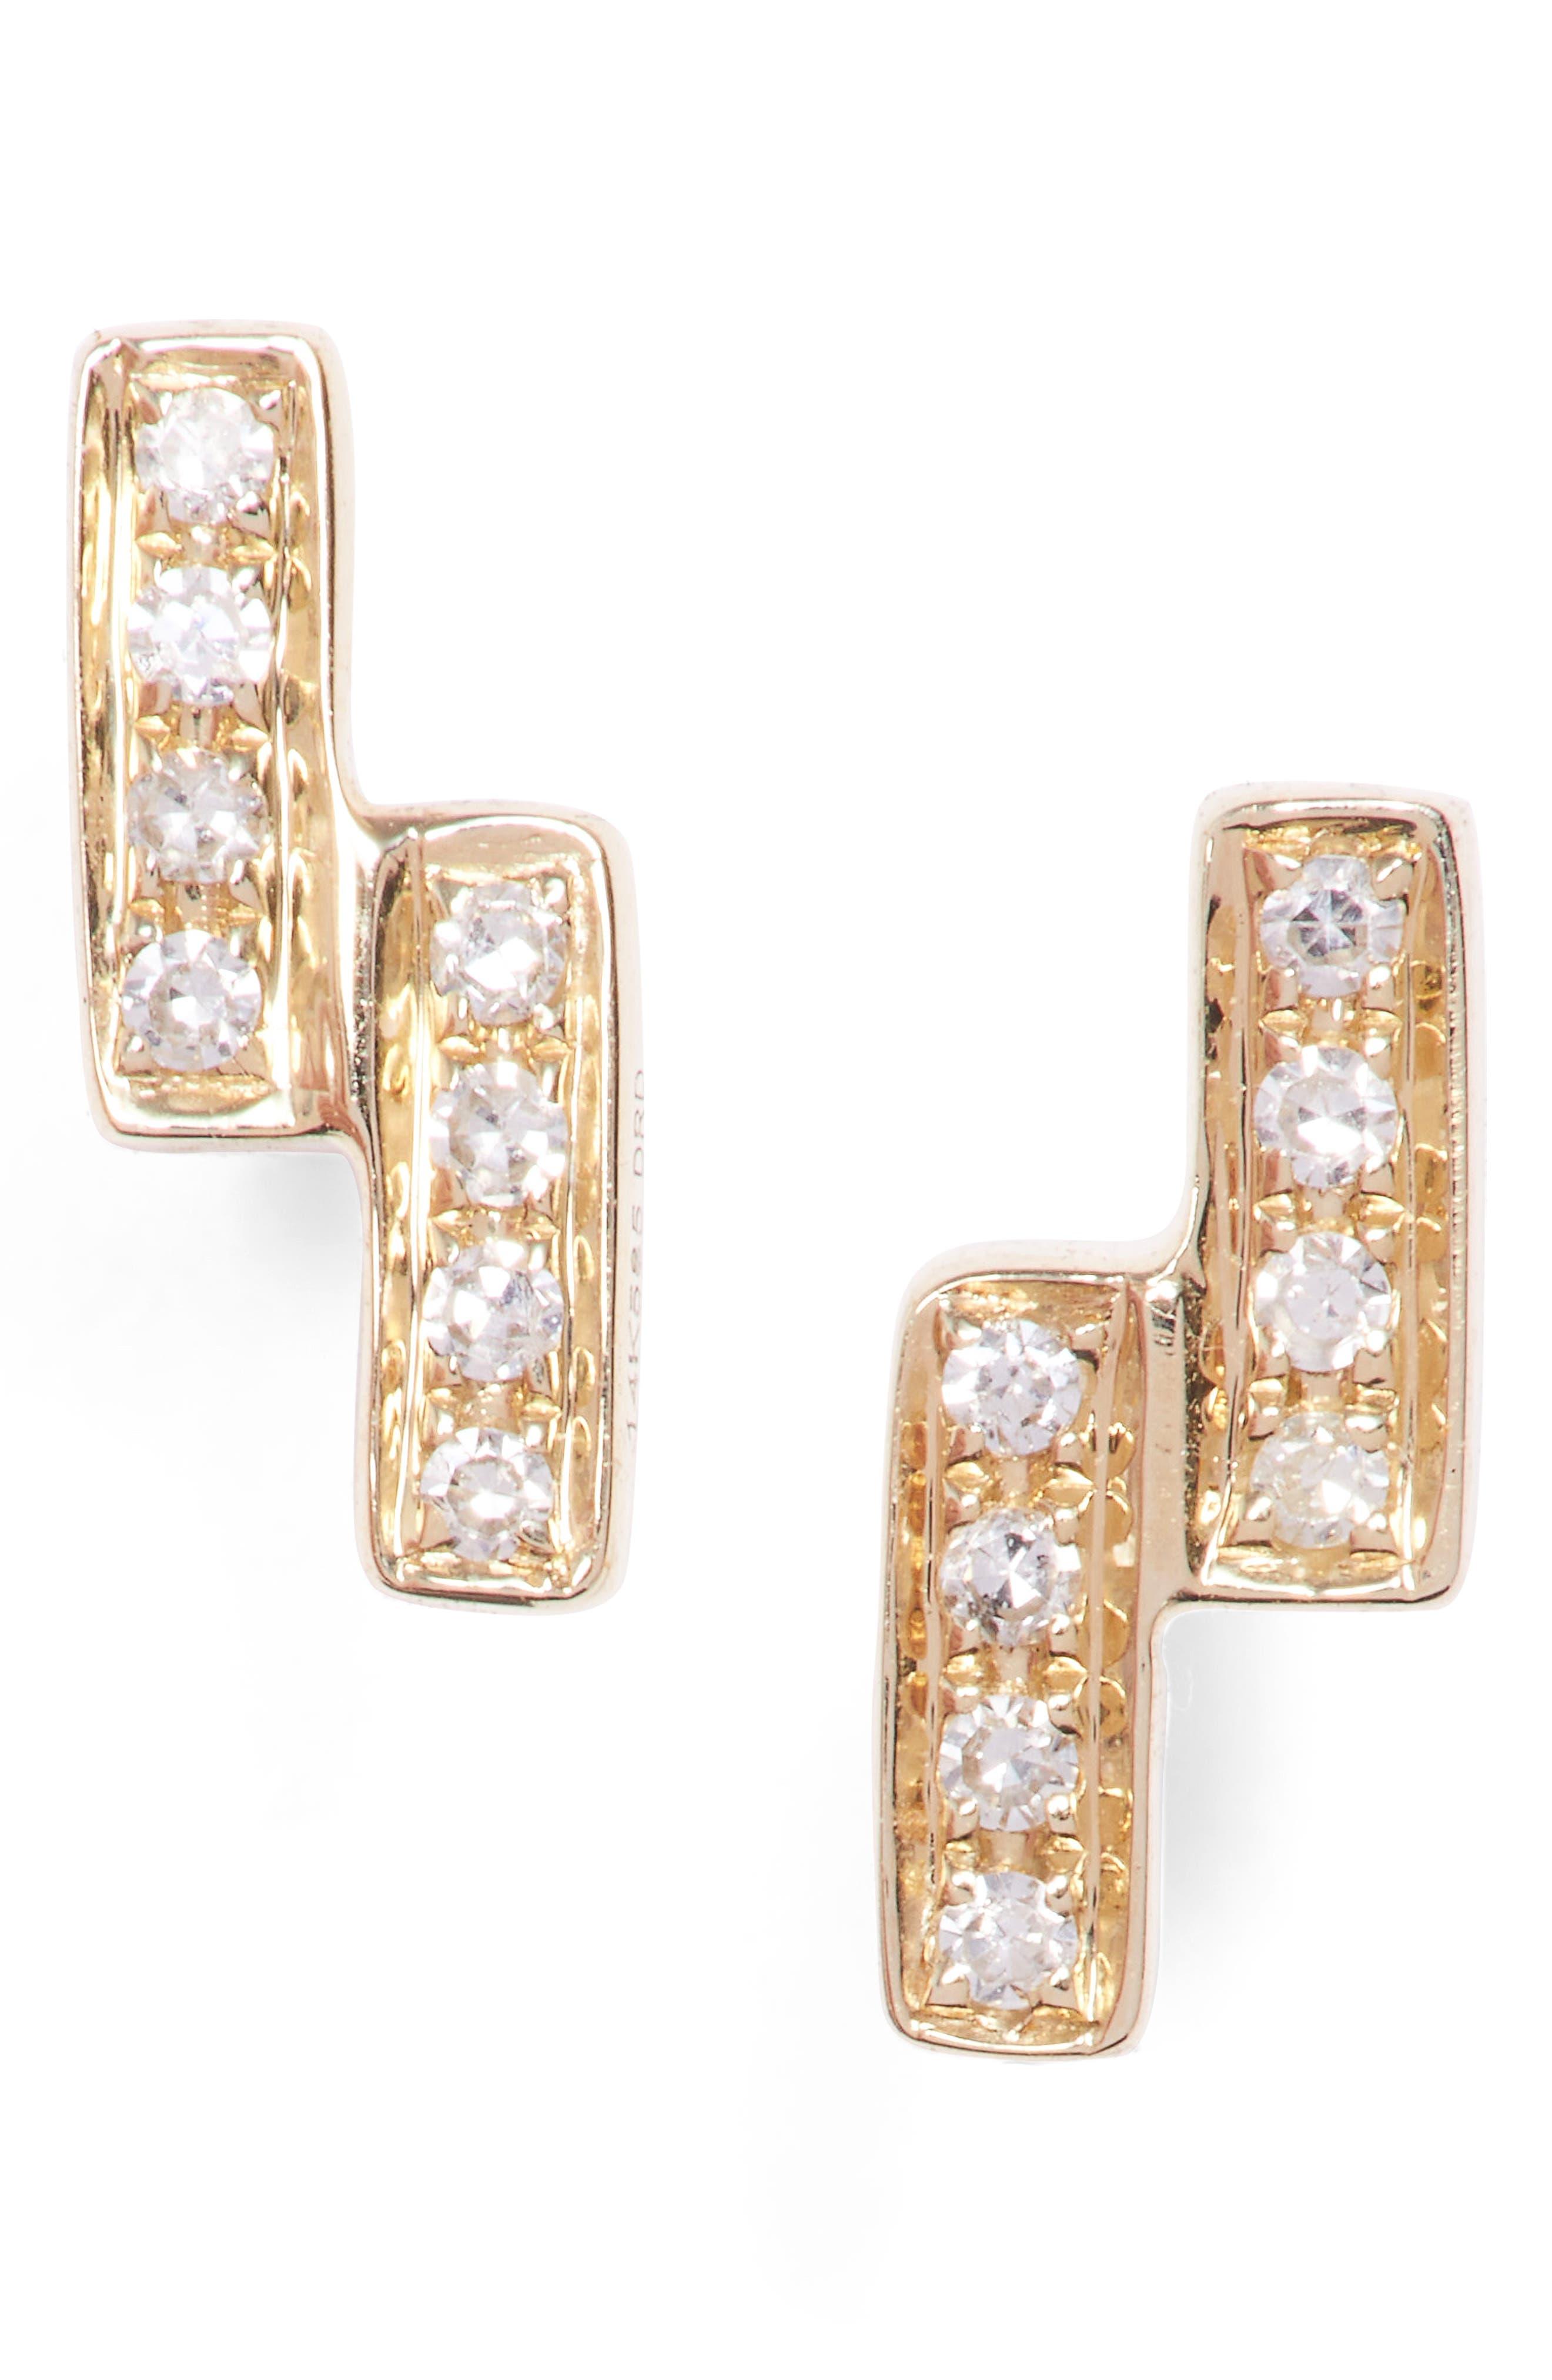 Mikimoto Akoya Pearl & Diamond Stud Earrings